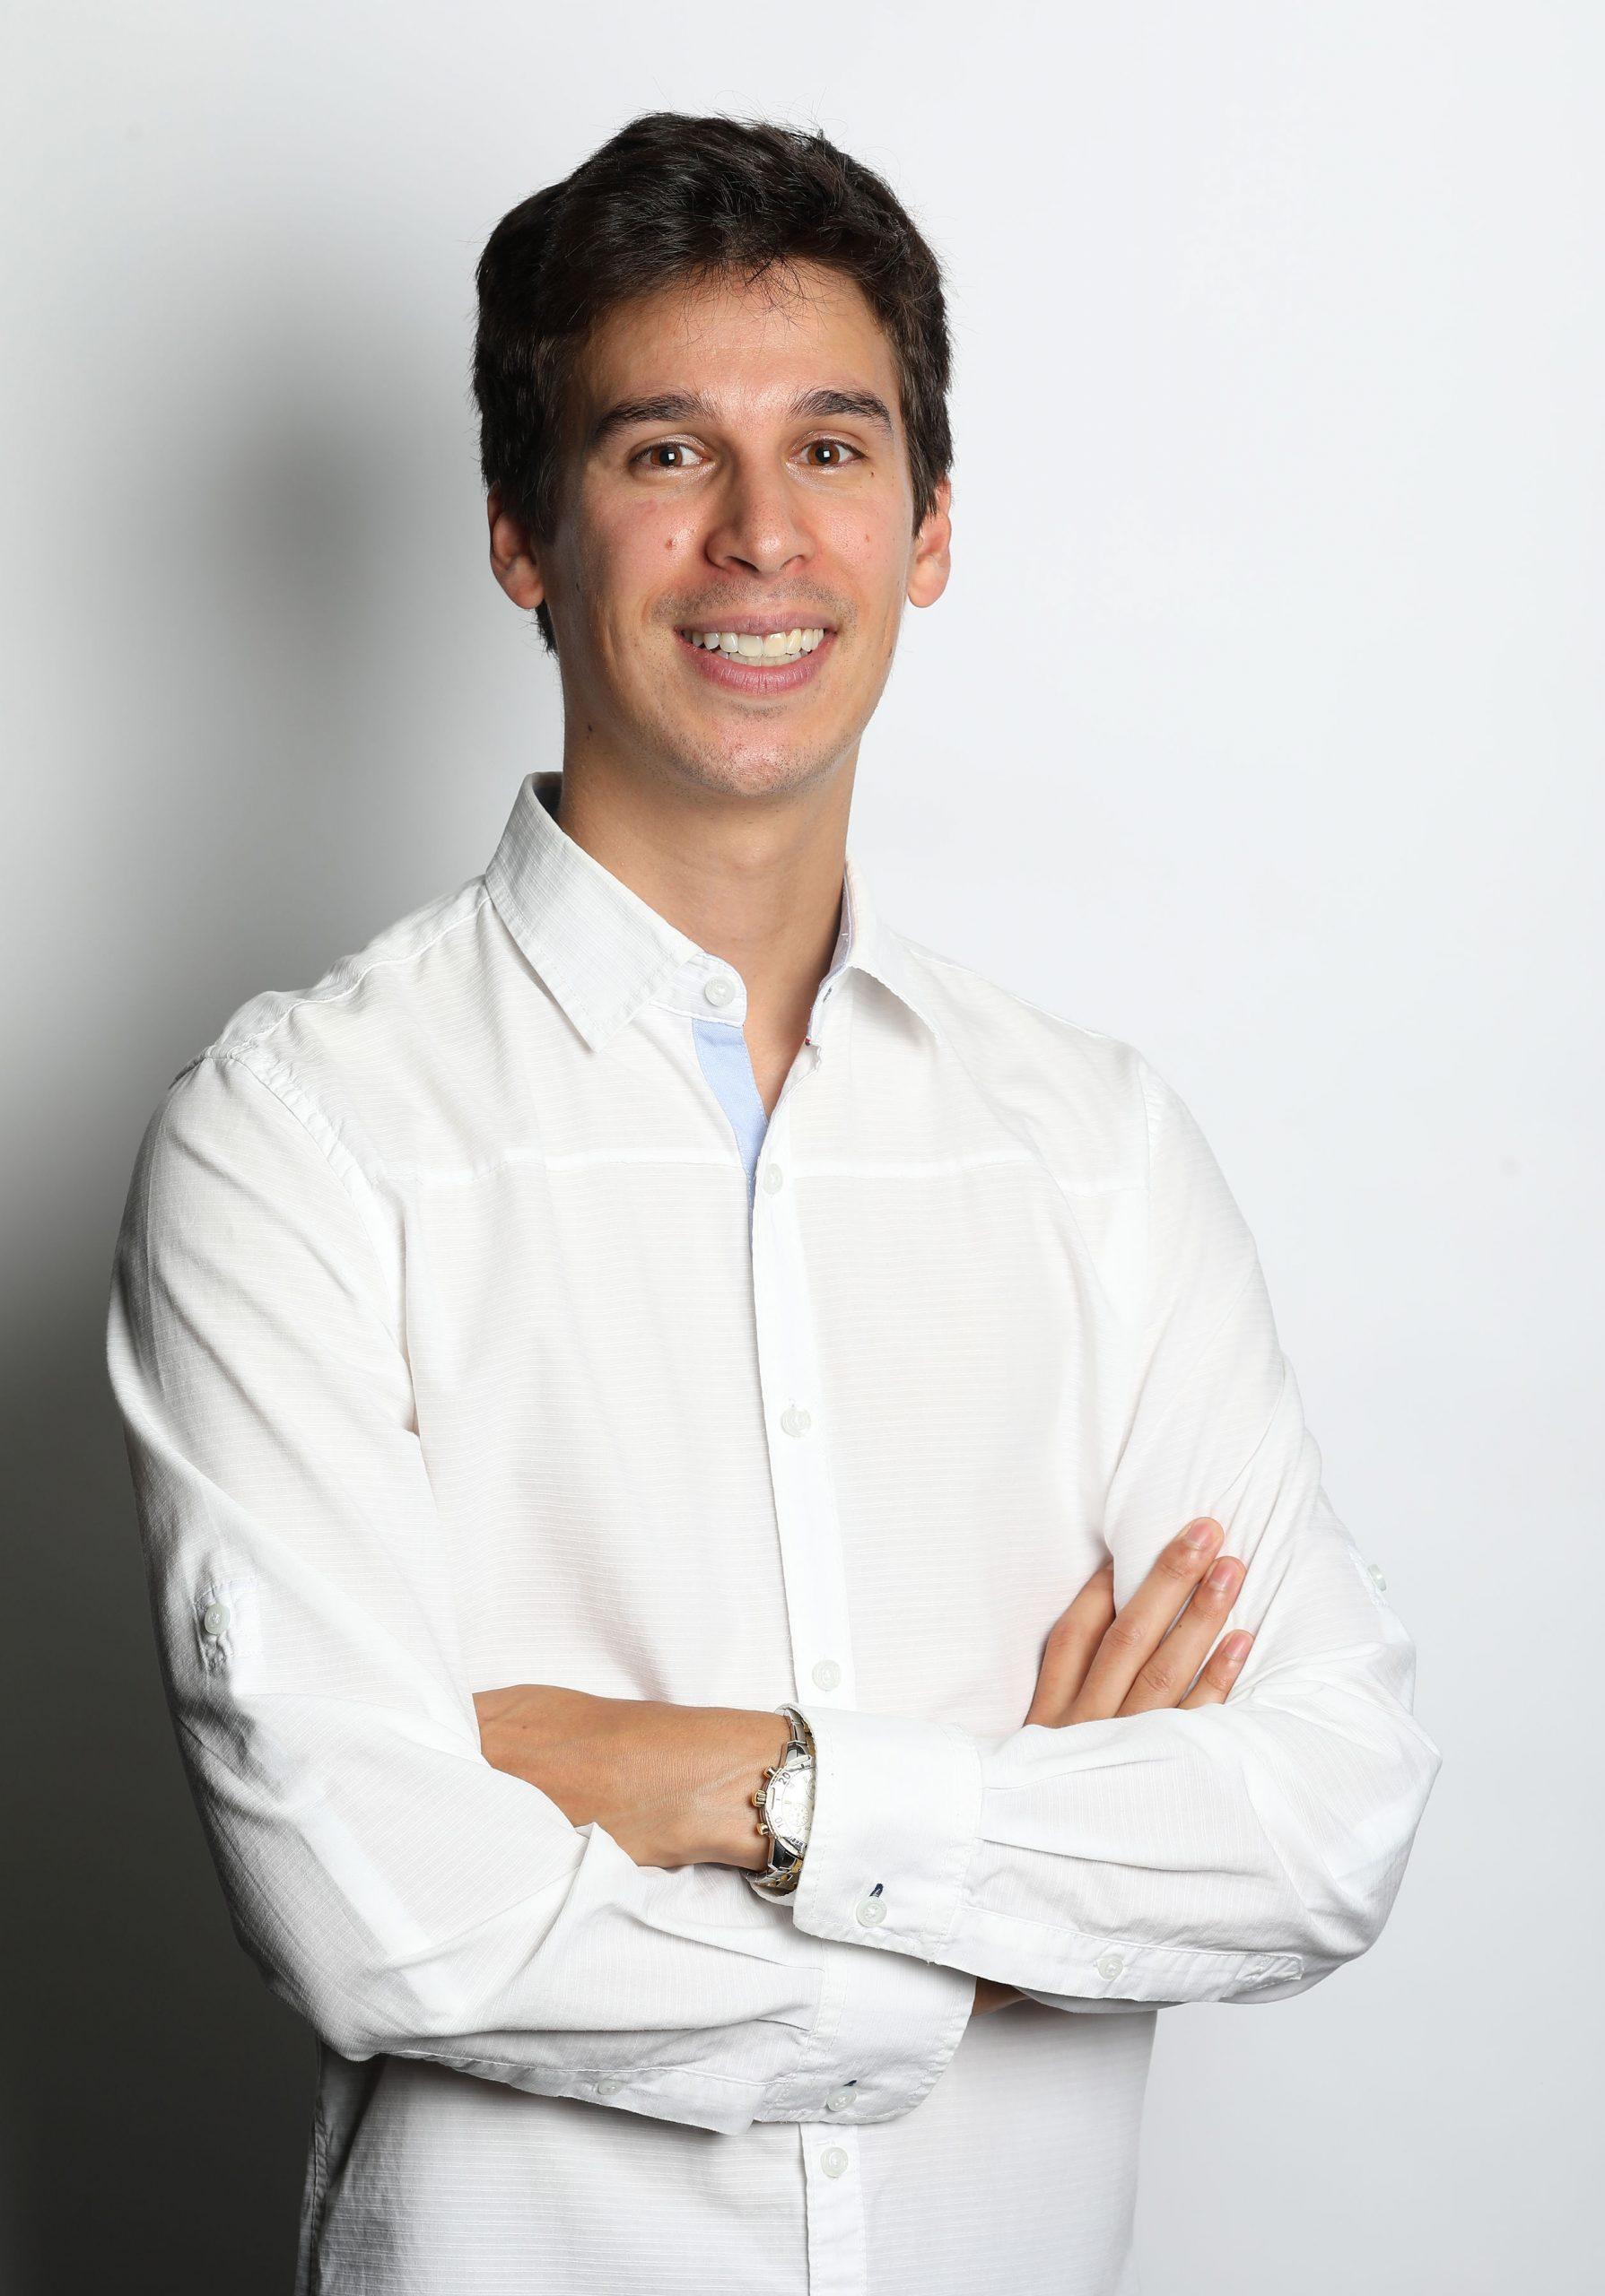 Alexandre Grégoire